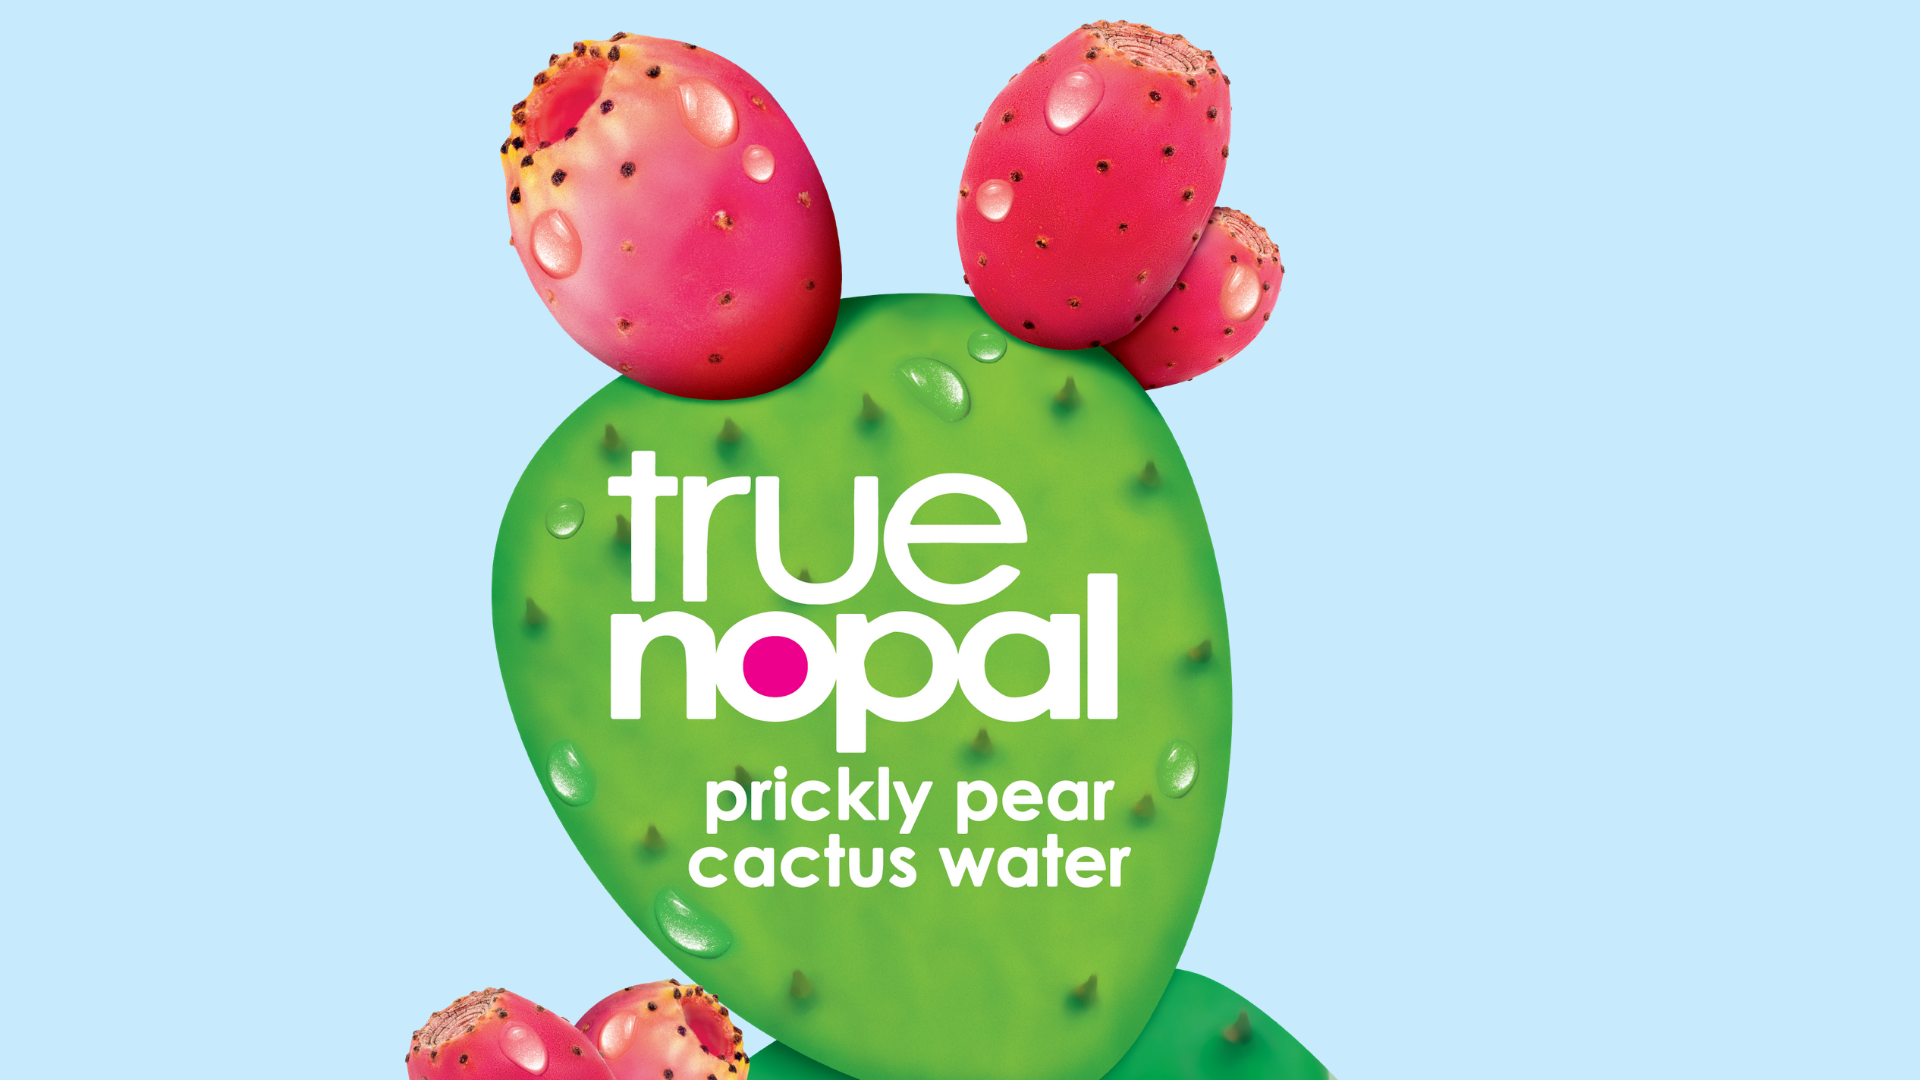 True Nopal Prickly Pear Cactus Water